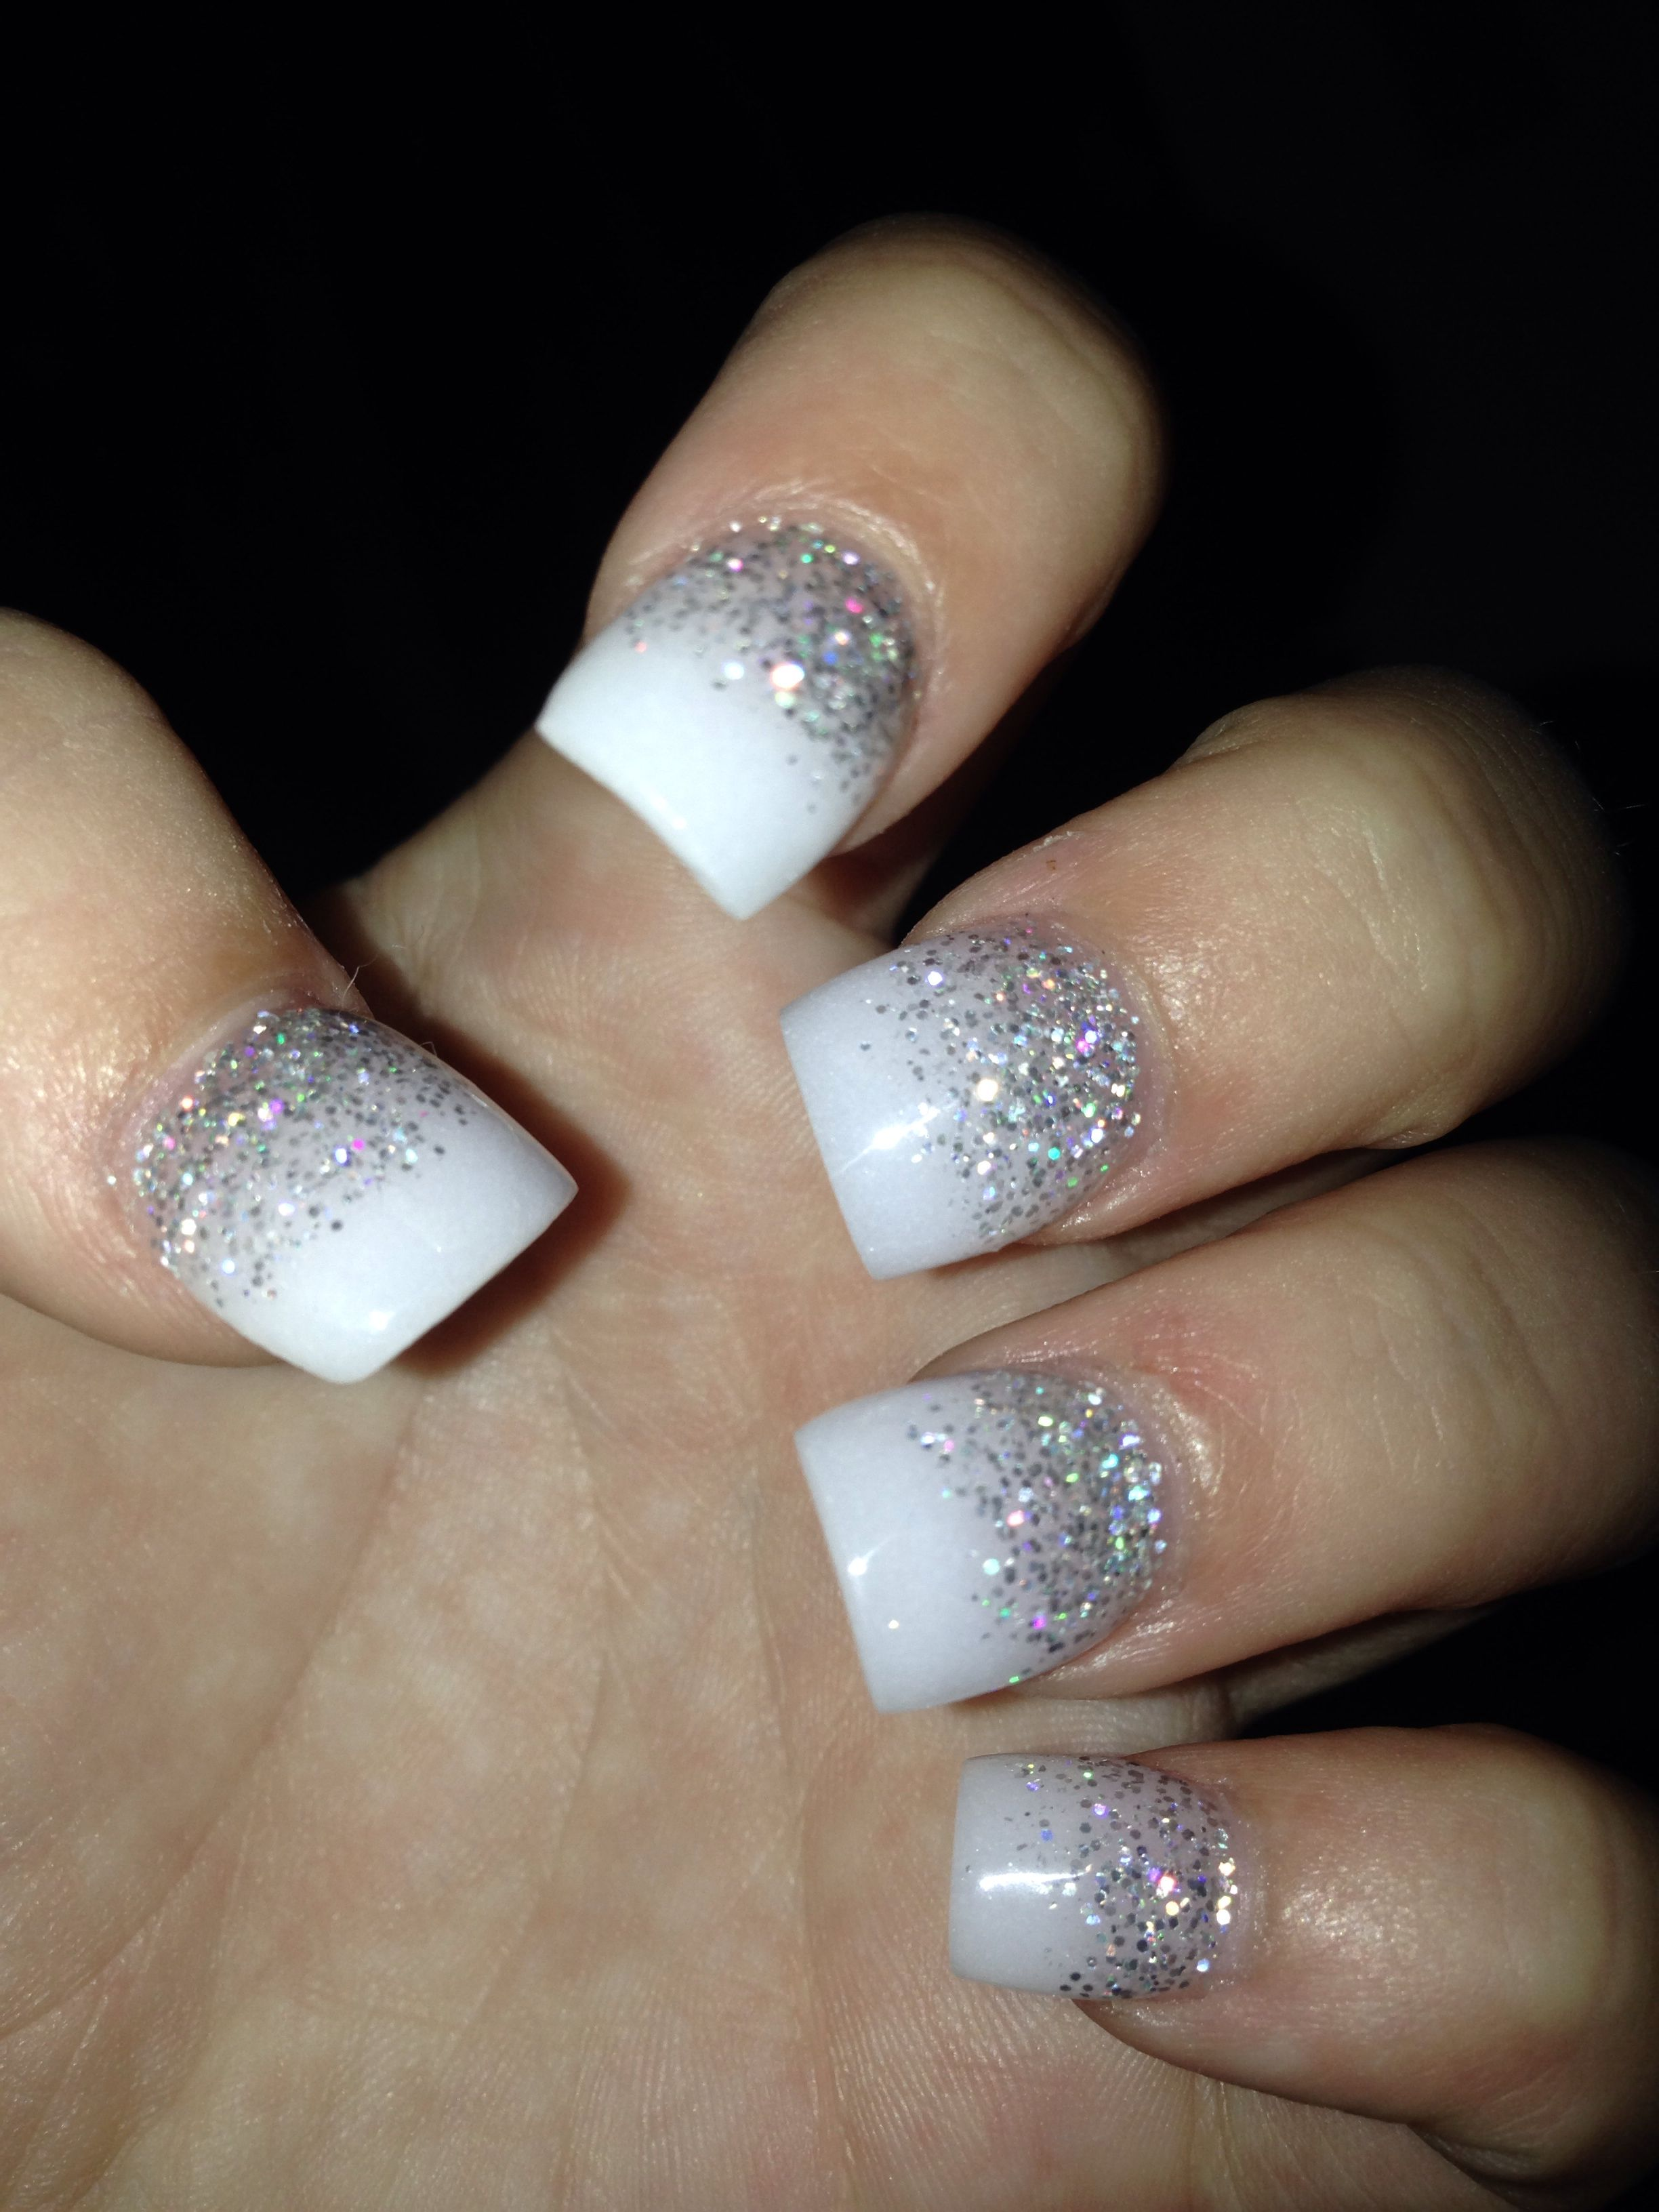 white and silver solar nails #solarnails | nails | Pinterest | Solar ...